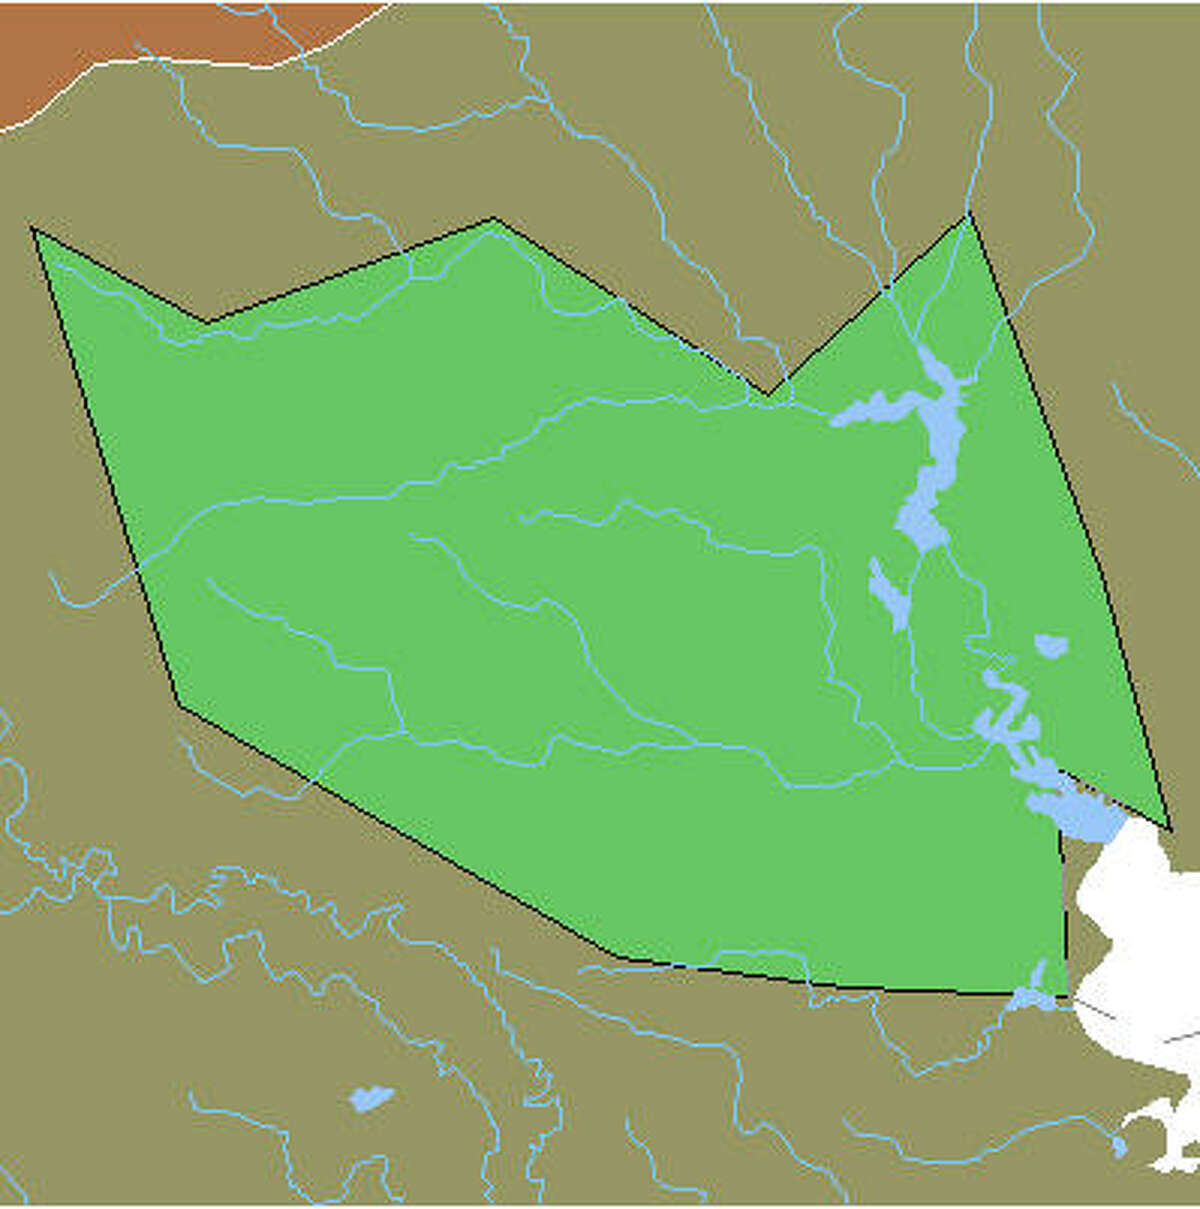 County: HarrisAttending school: 379Non-natives: 1,403